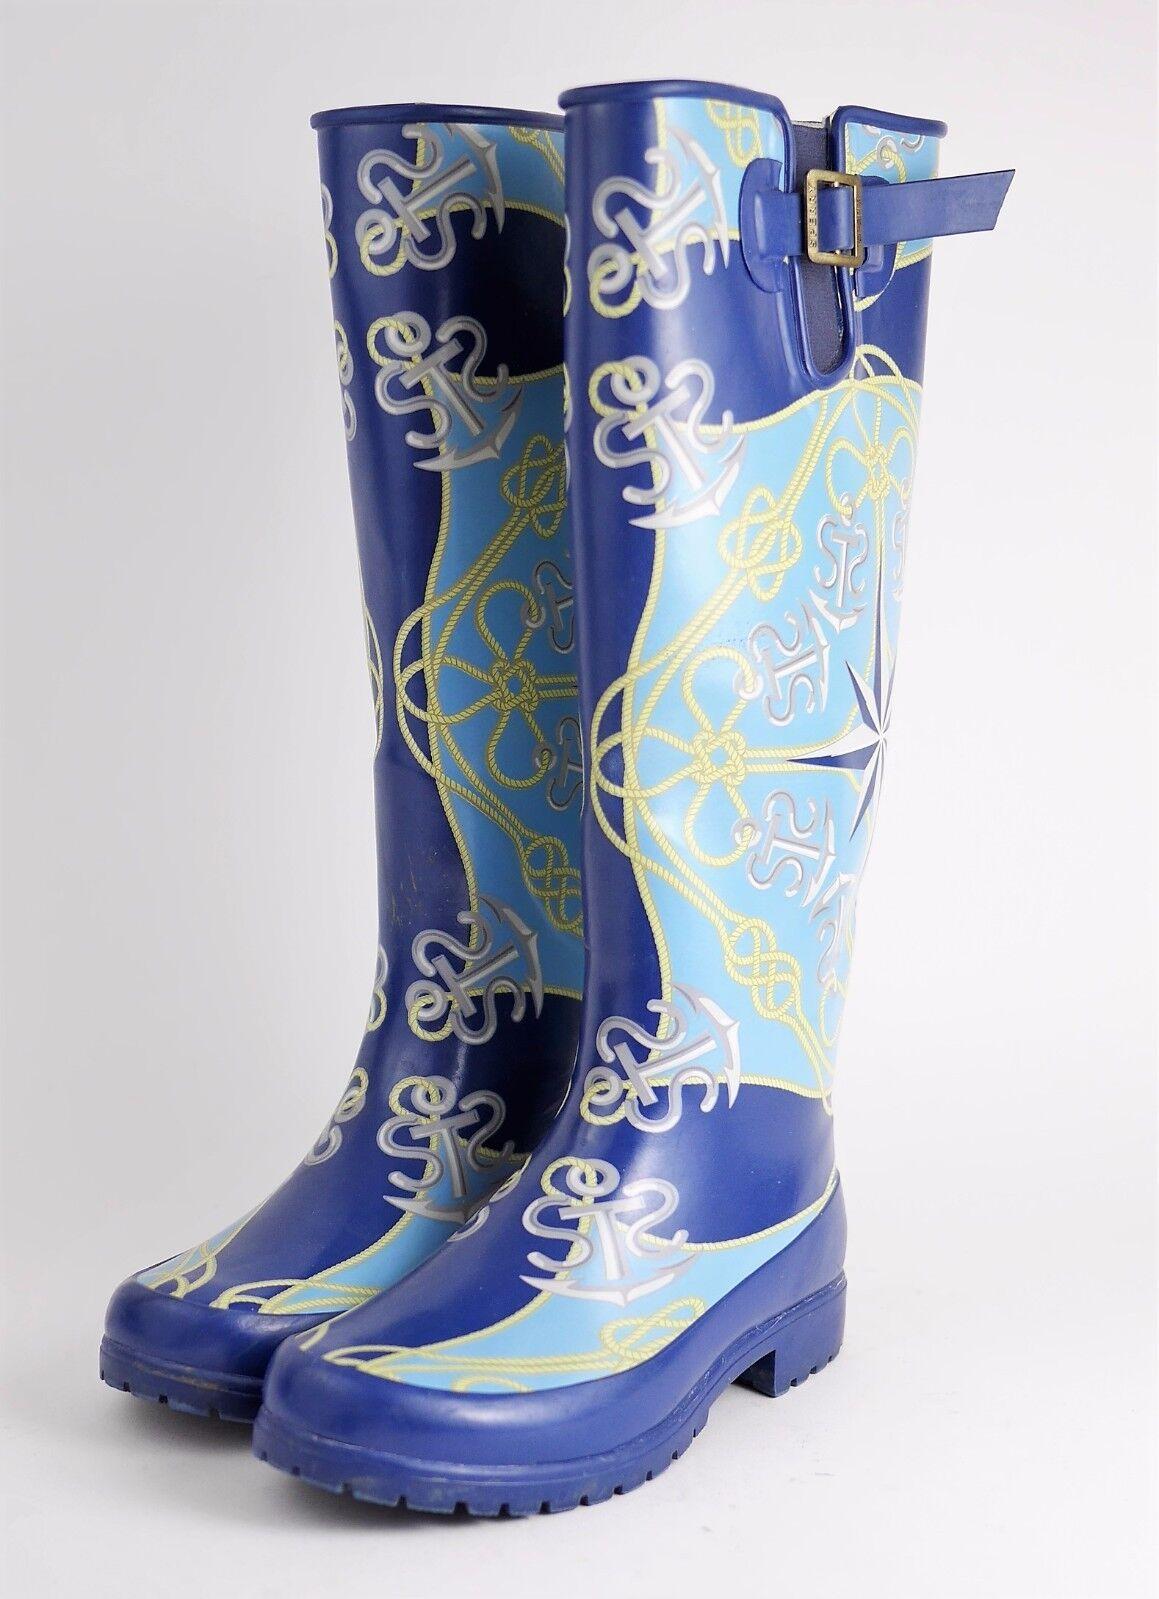 SPERRY TOP-SIDER Blau Nautical Anchor Tall Rubber Rain Stiefel - damen Größe 6